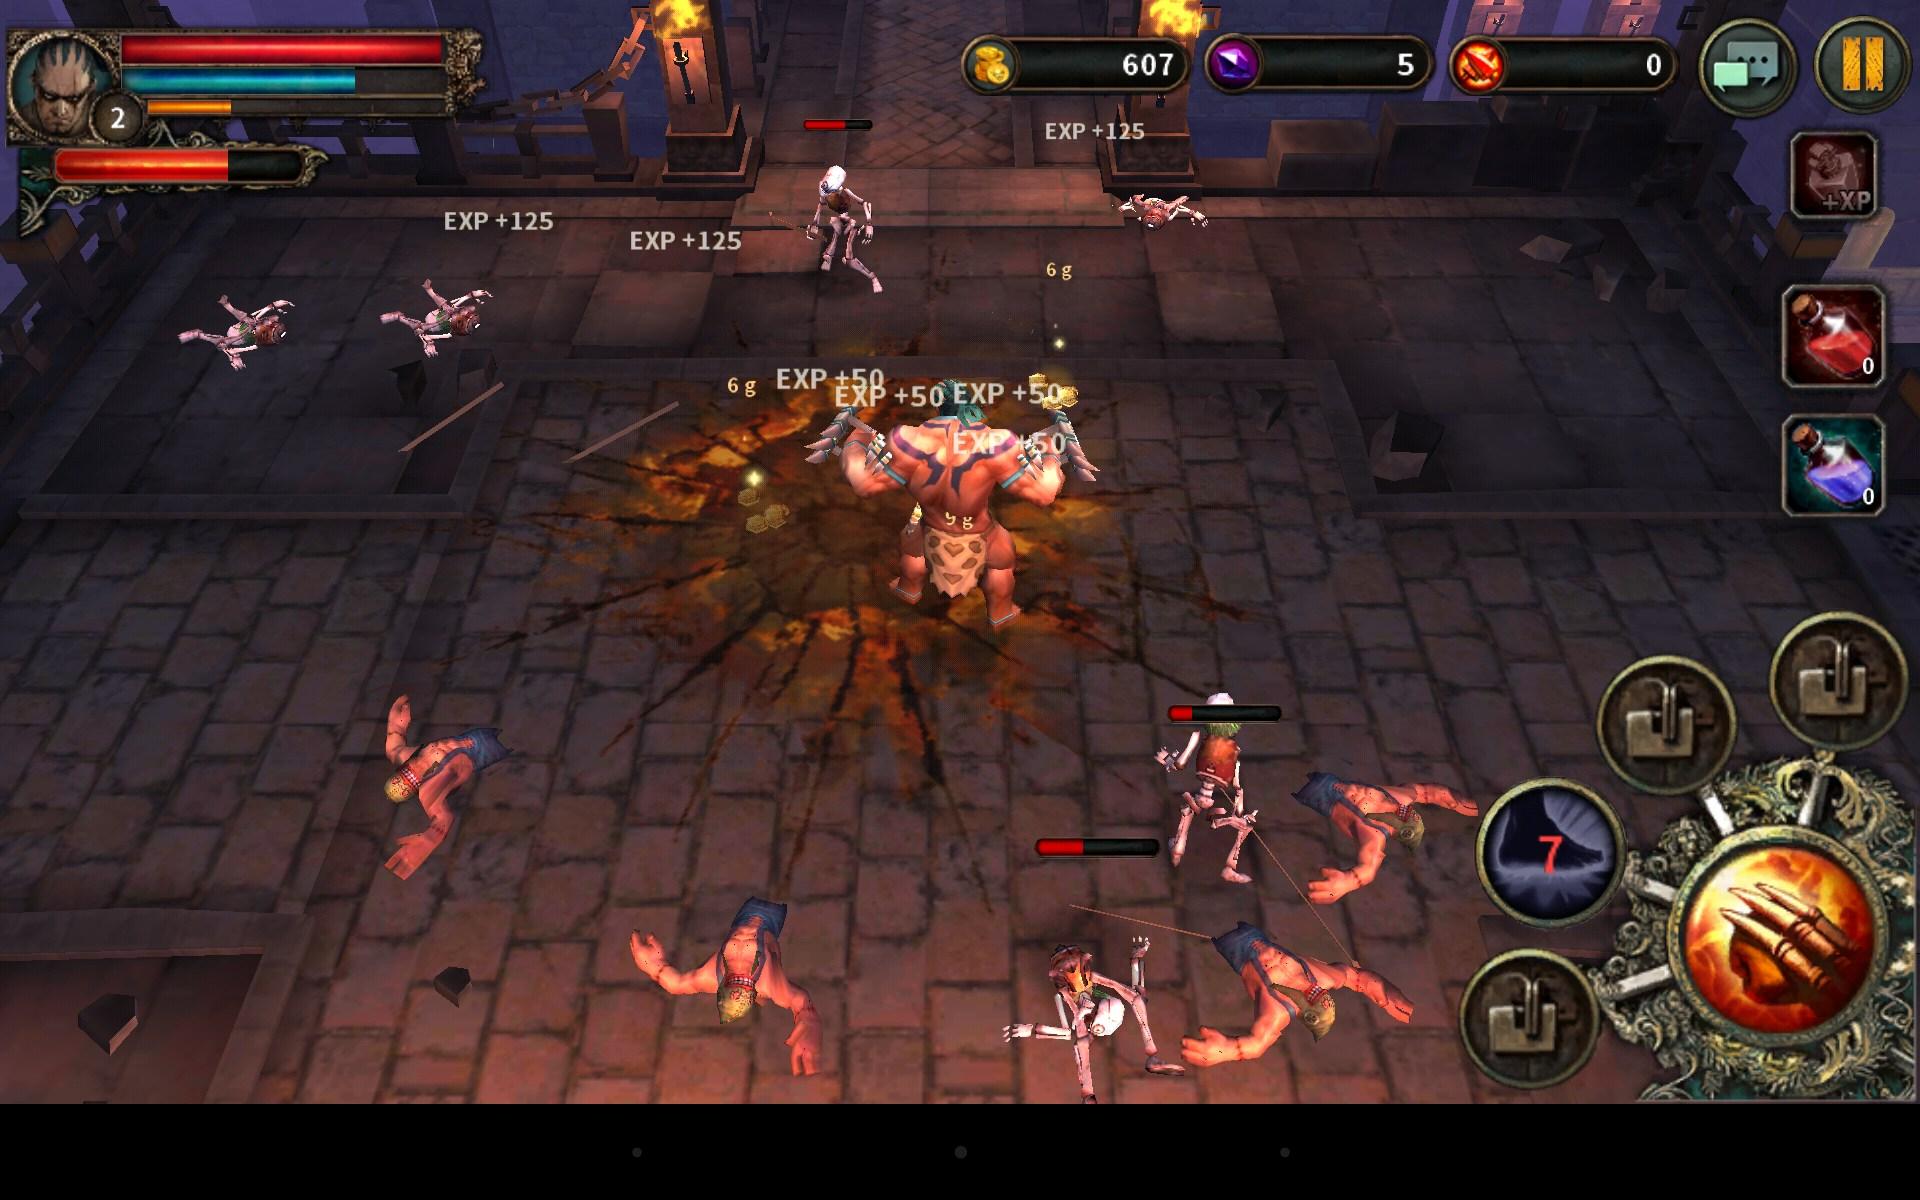 Dark Avenger, a popular hack-and-slash mobile RPG.